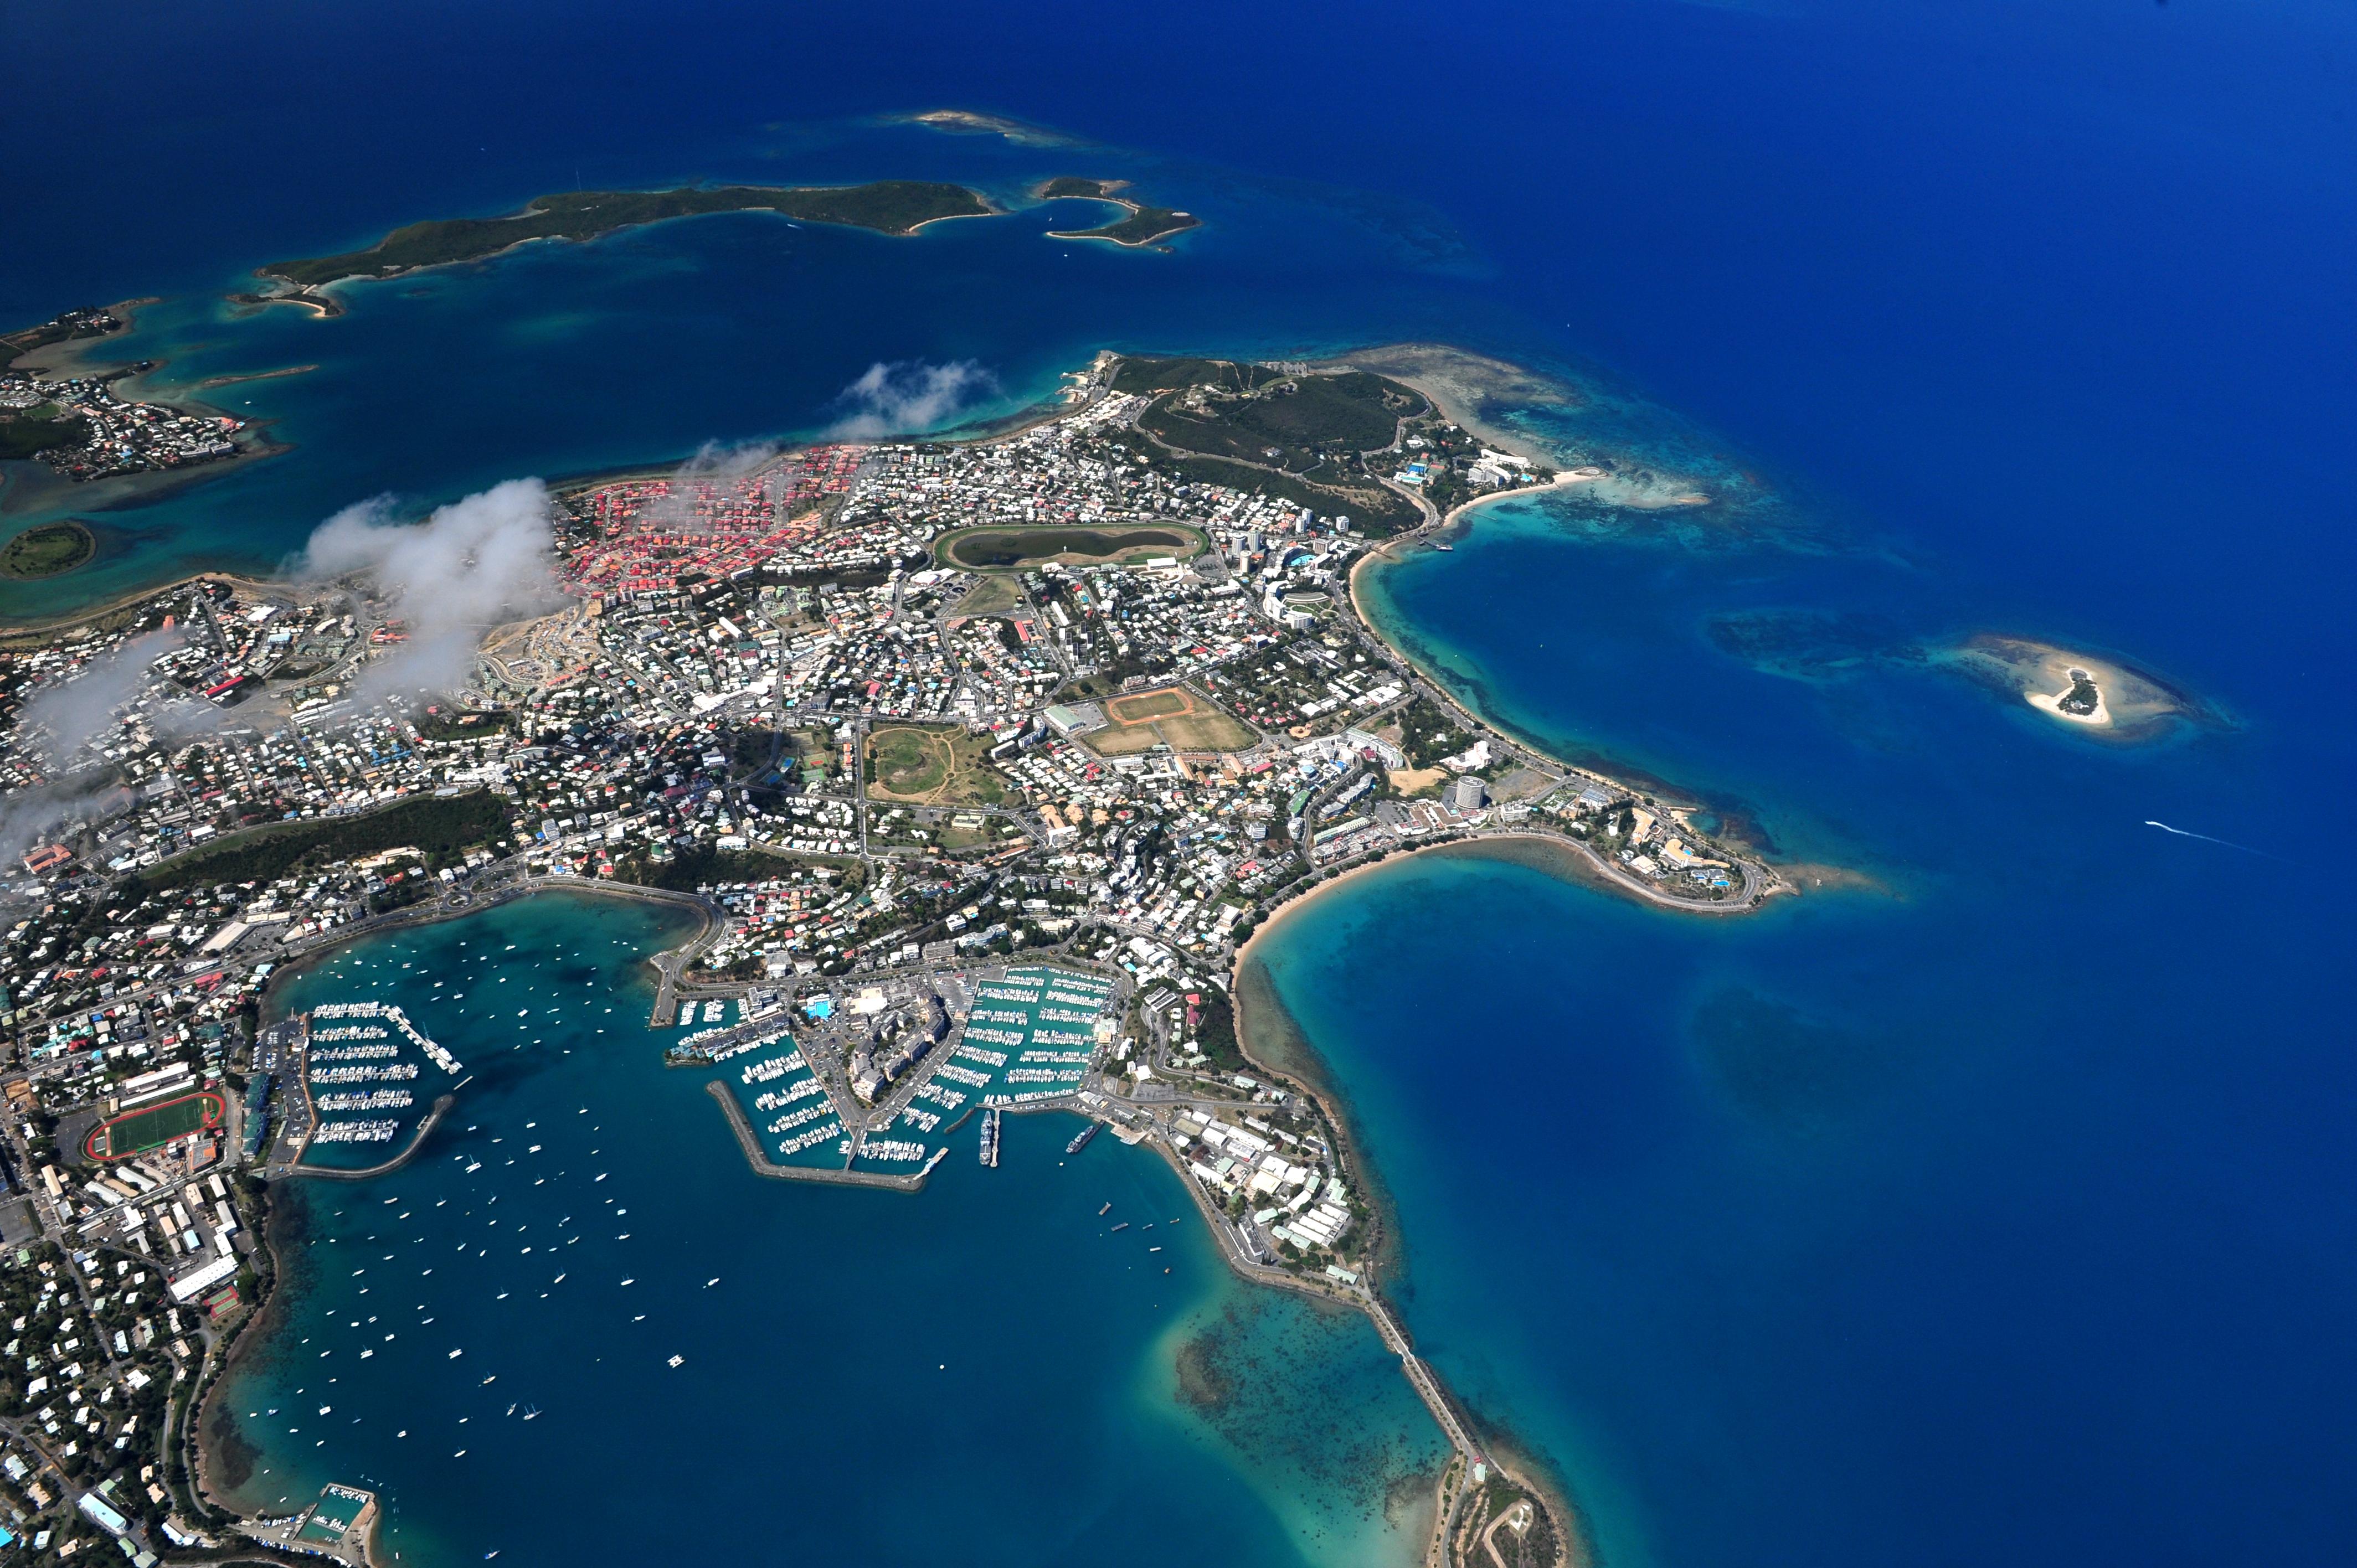 Baies de Nouméa